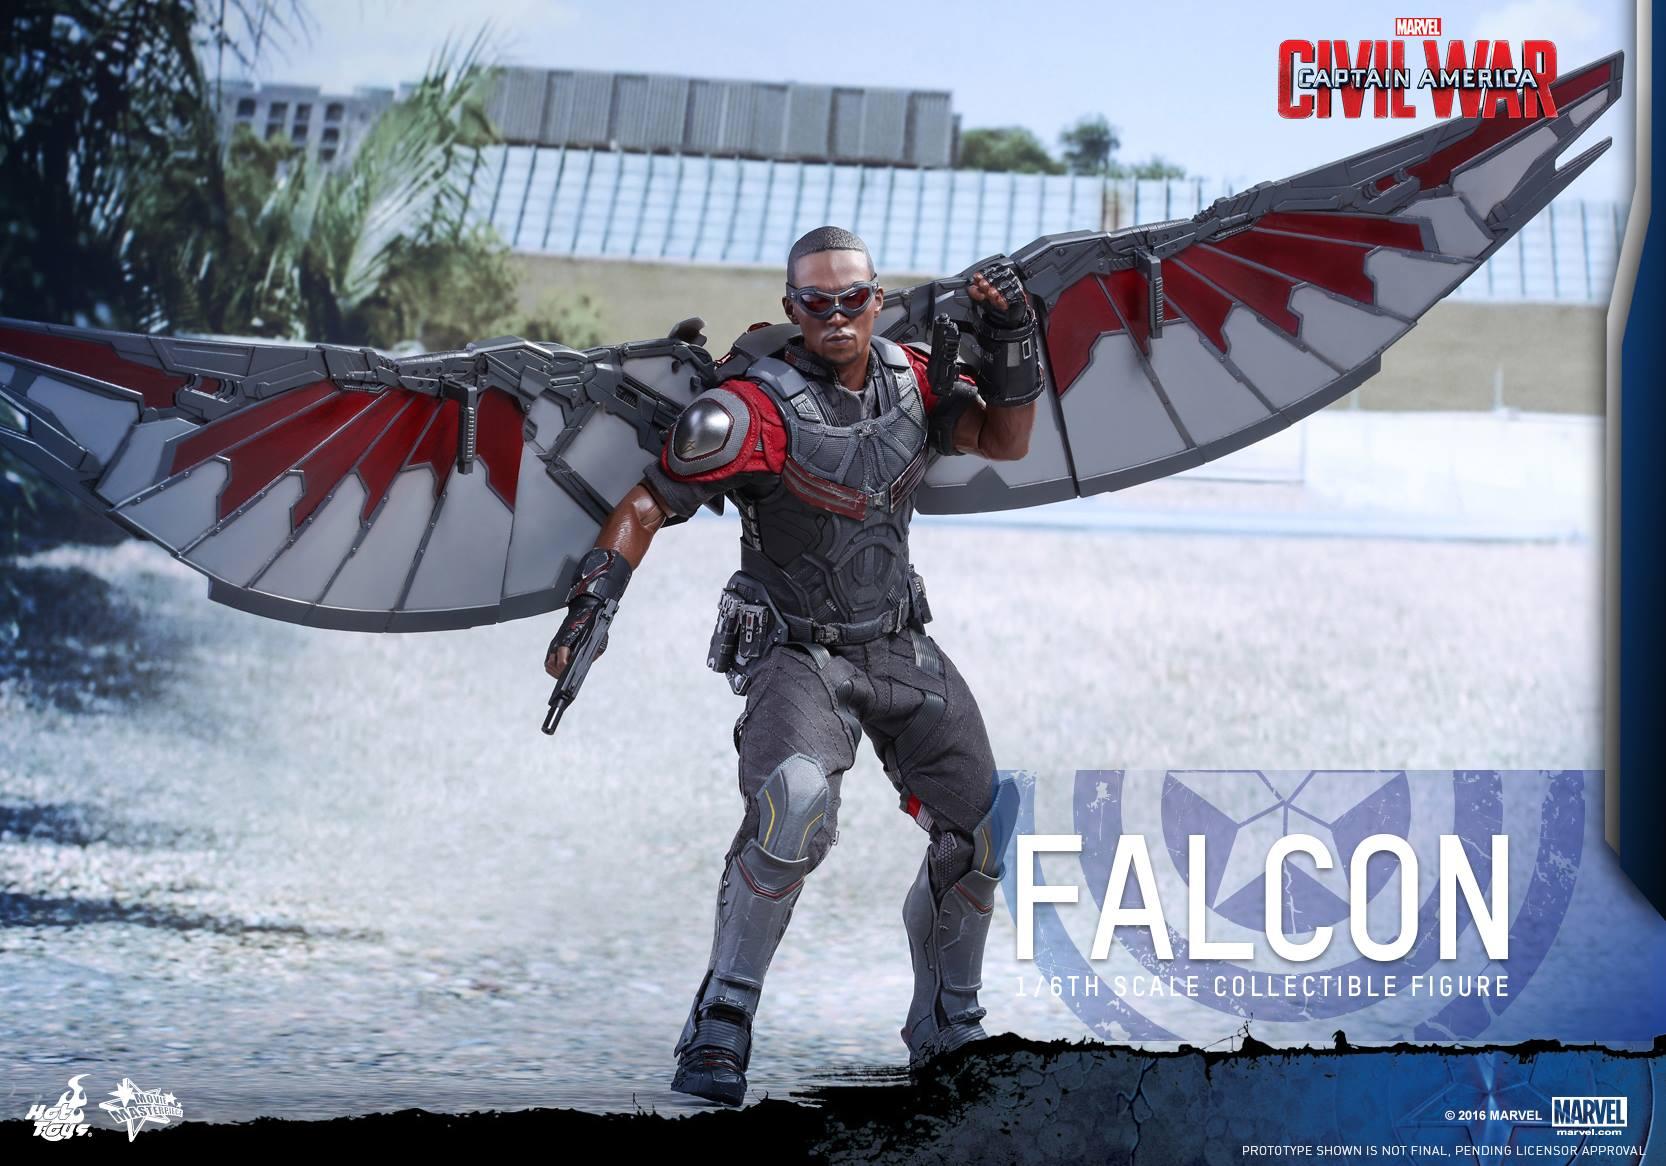 Hot Toys Captain America: Civil War Falcon Sixth Scale Figure